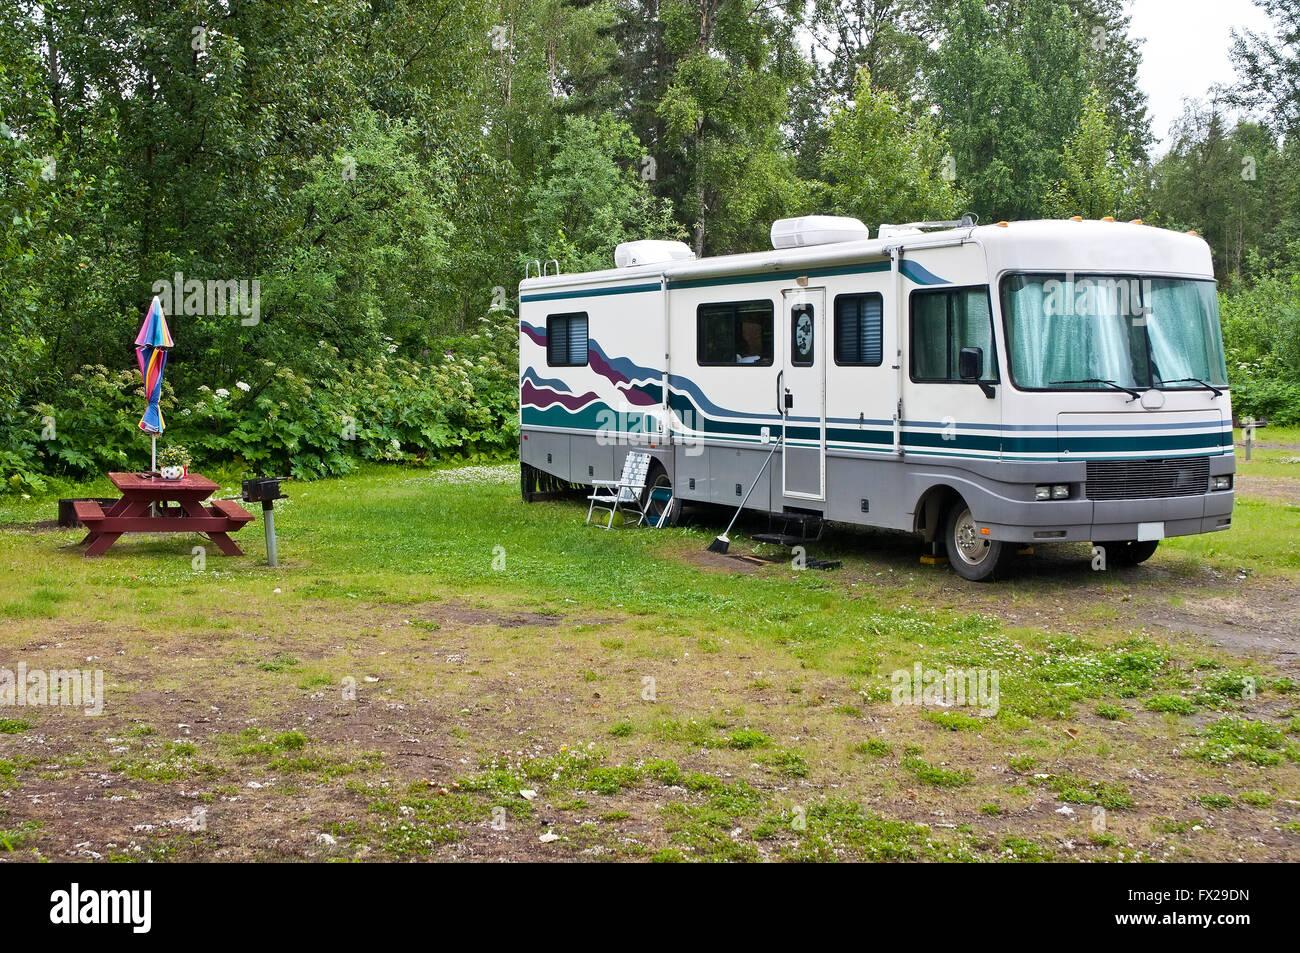 Rv Camping Site British Columbia Canada Stock Photo